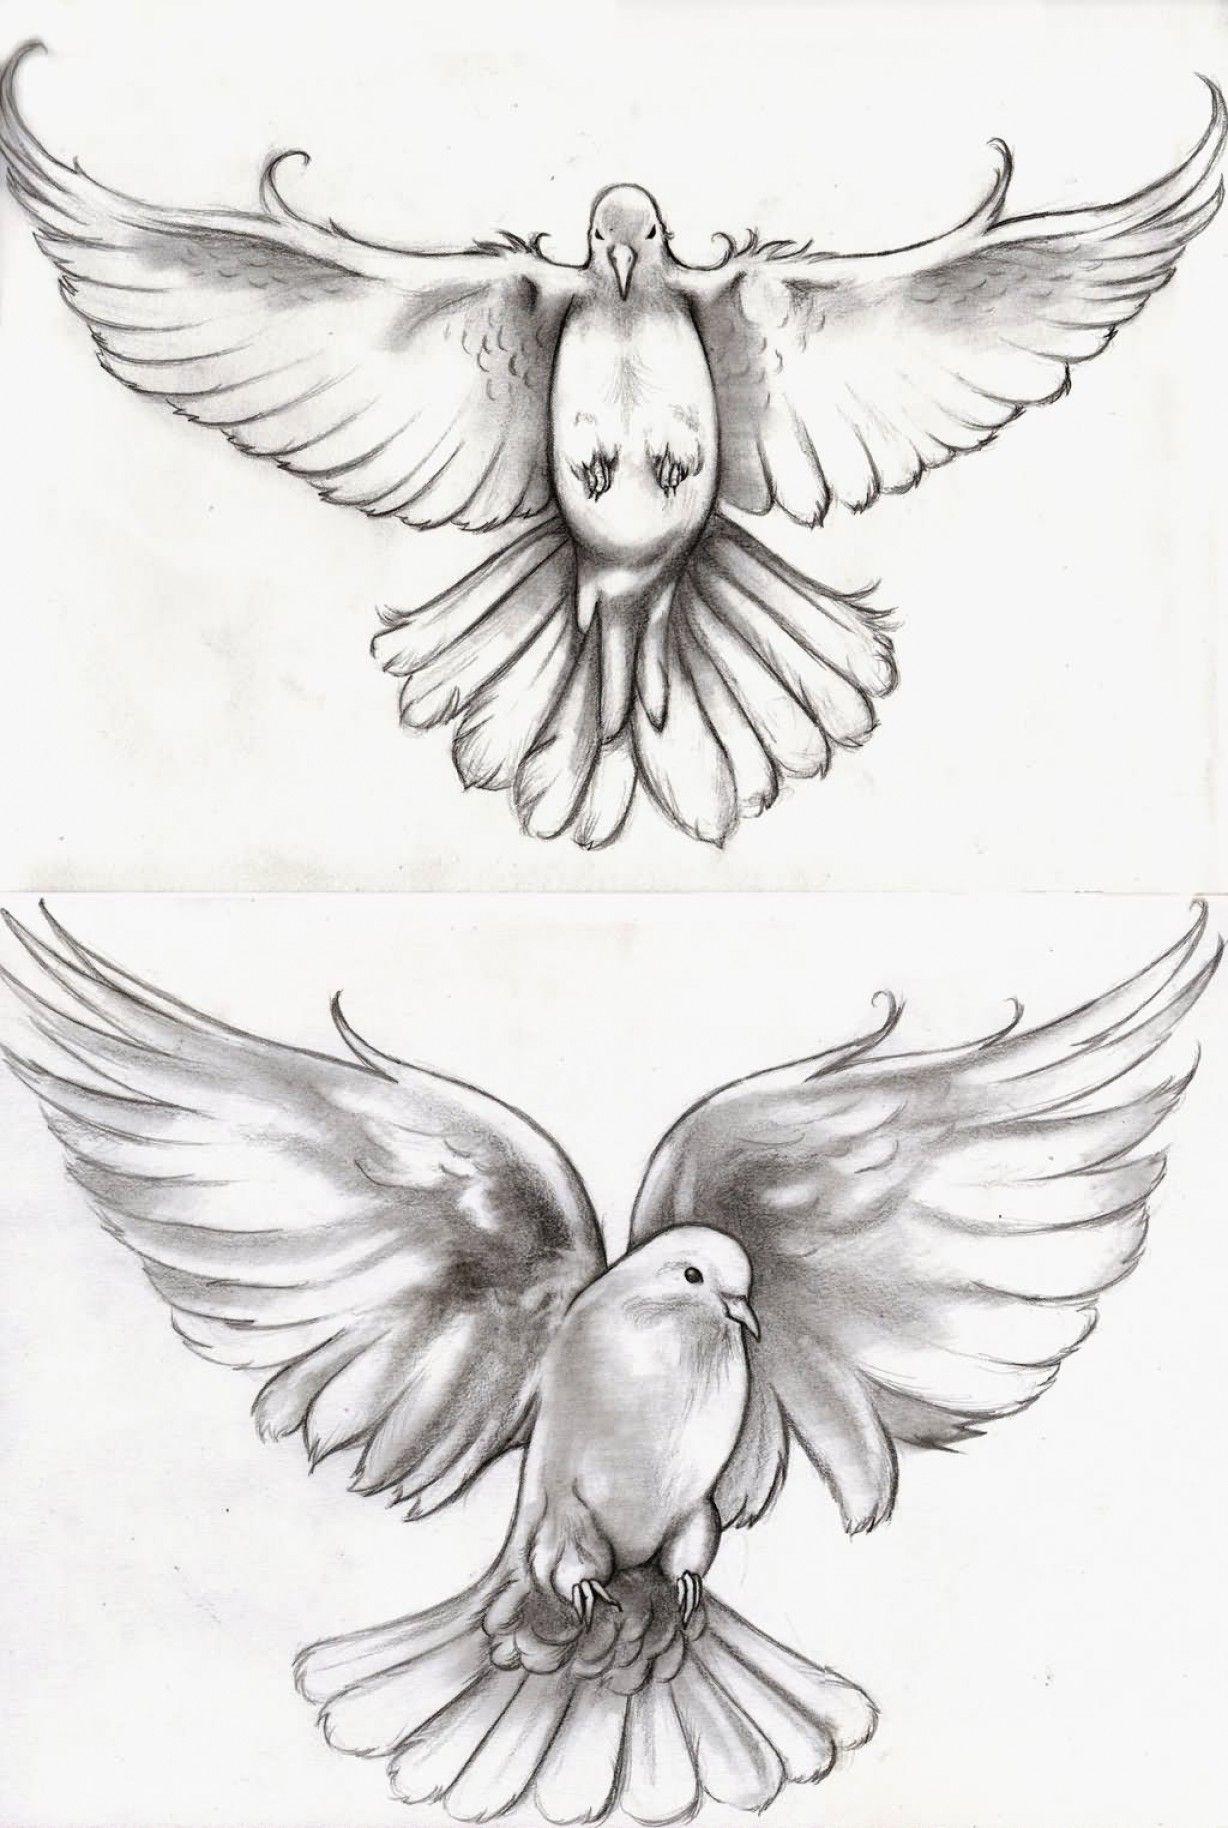 Pin De Luis Quinteros En Tatuajes Diseno De Tatuaje De Paloma Tatuaje De Buceo Paloma Tatuaje